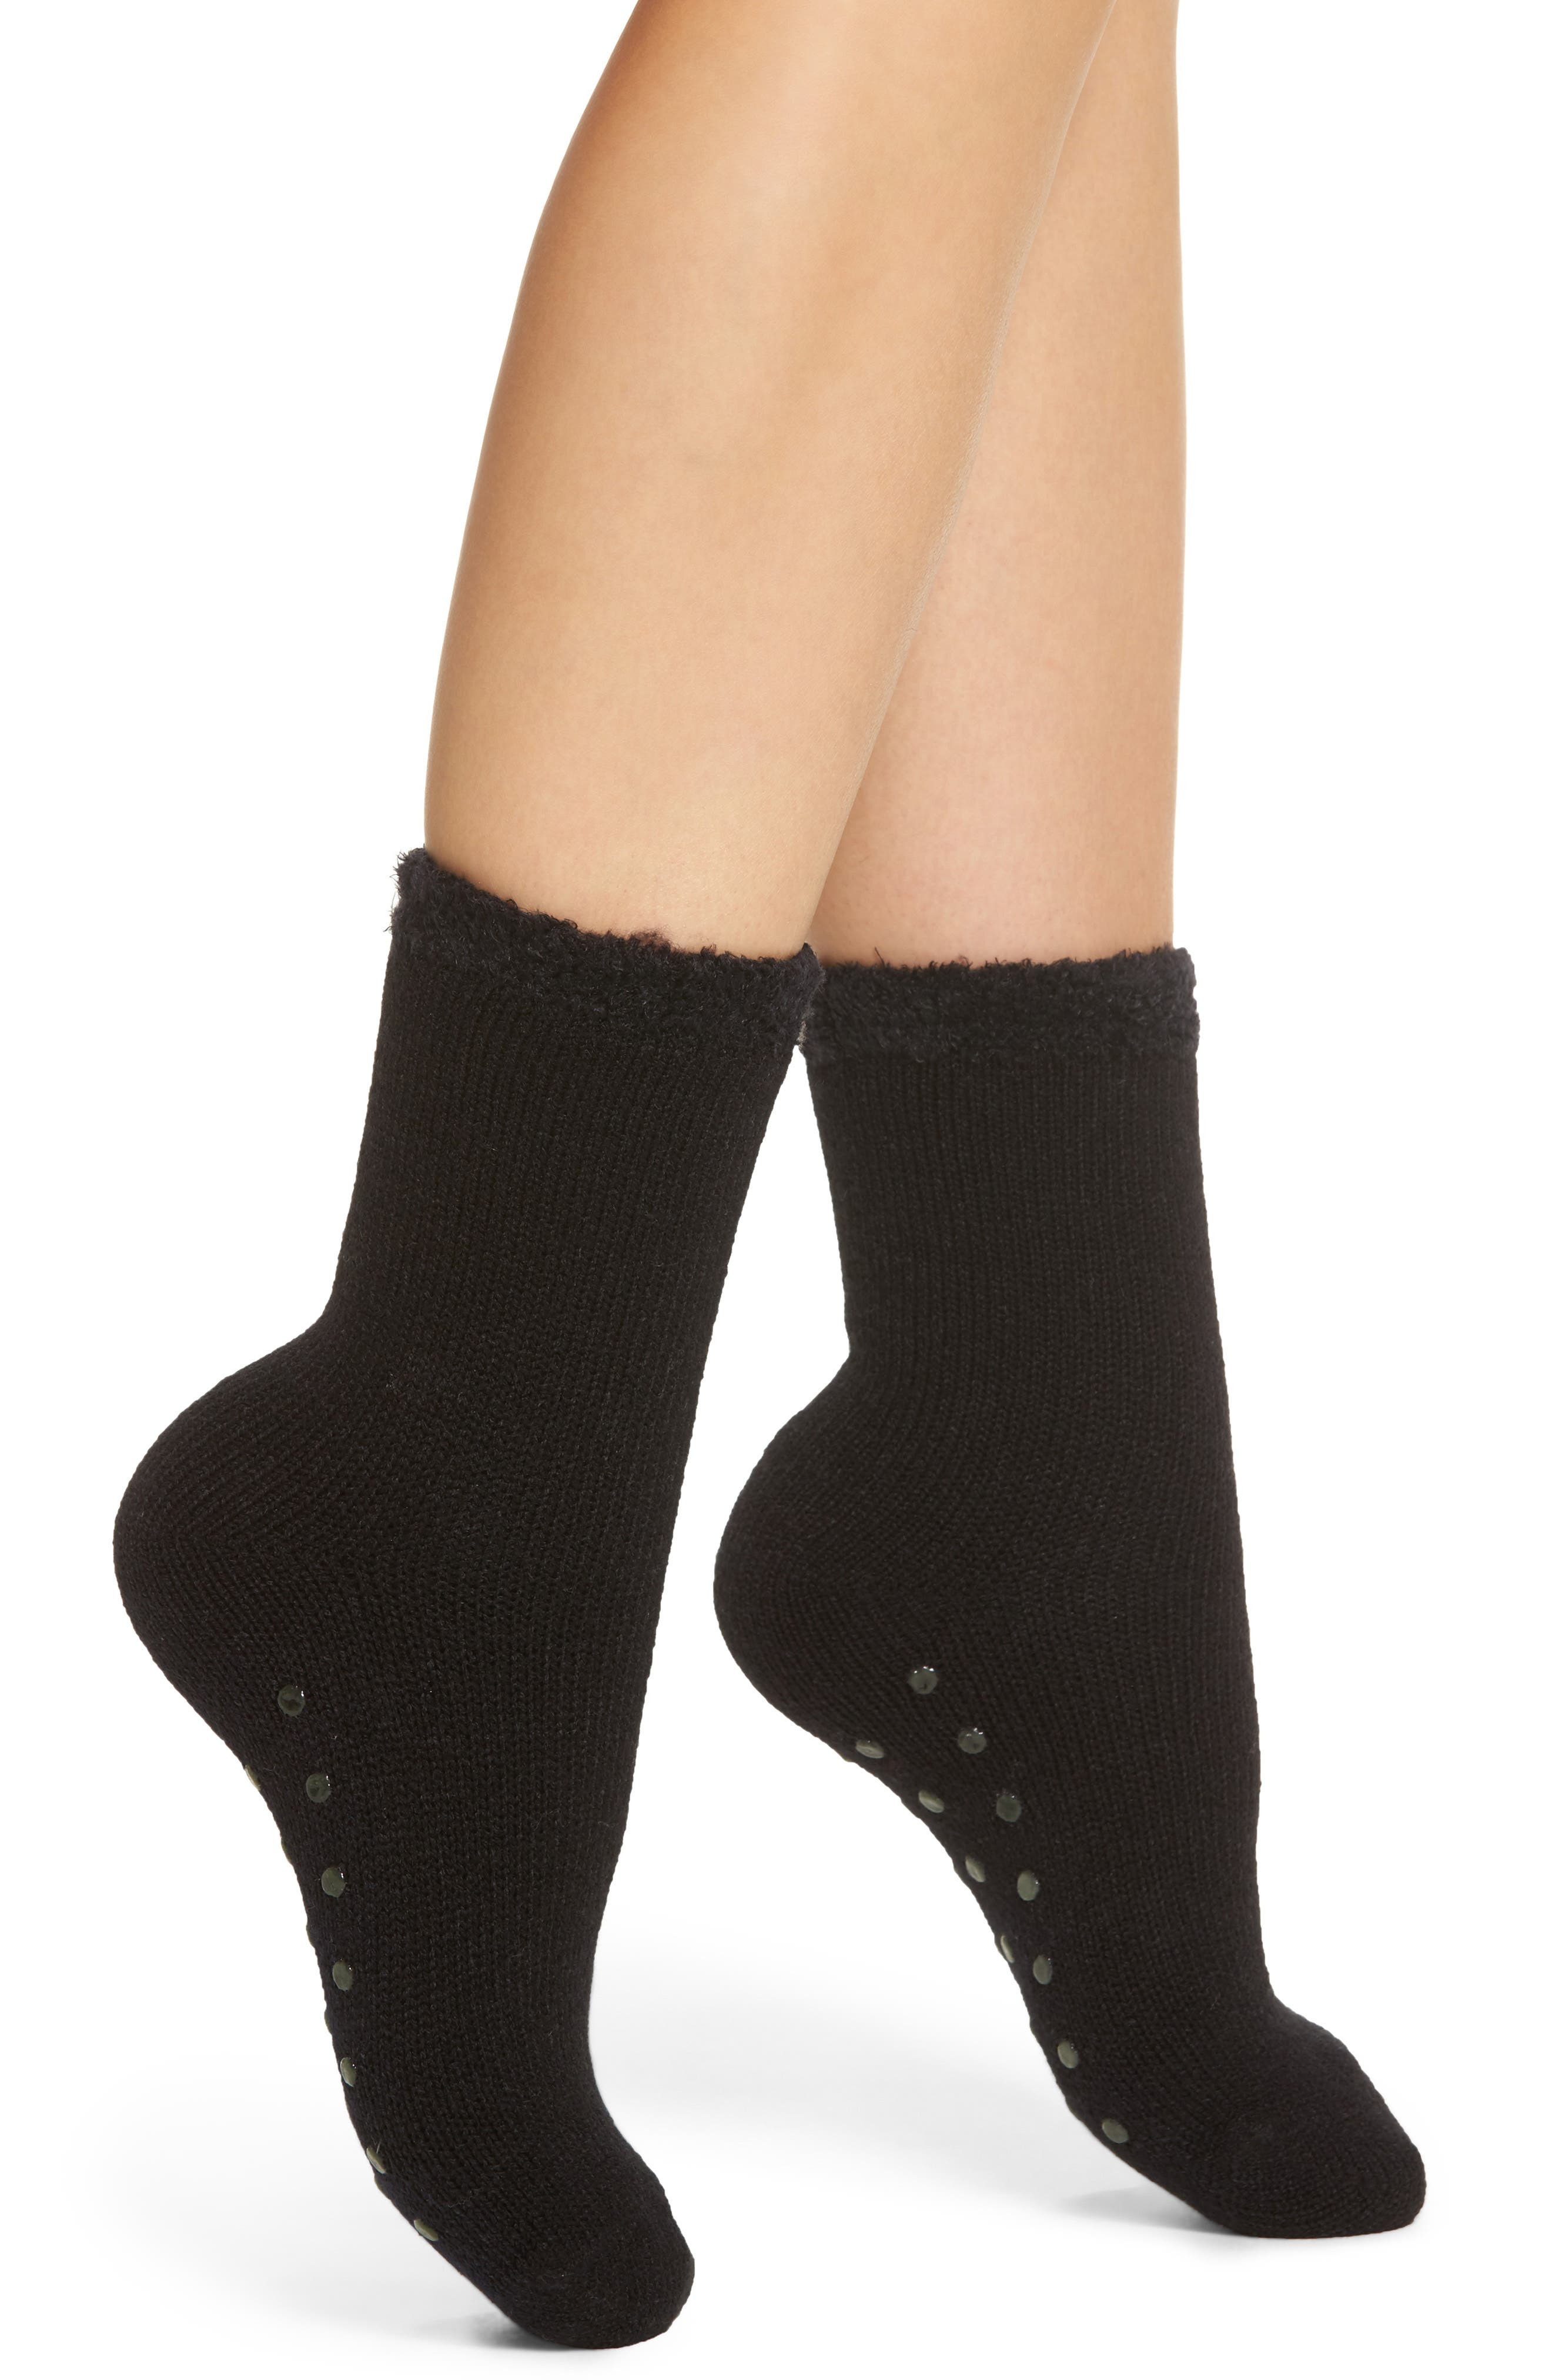 Butter Cuff Socks,                             Main thumbnail 1, color,                             BLACK